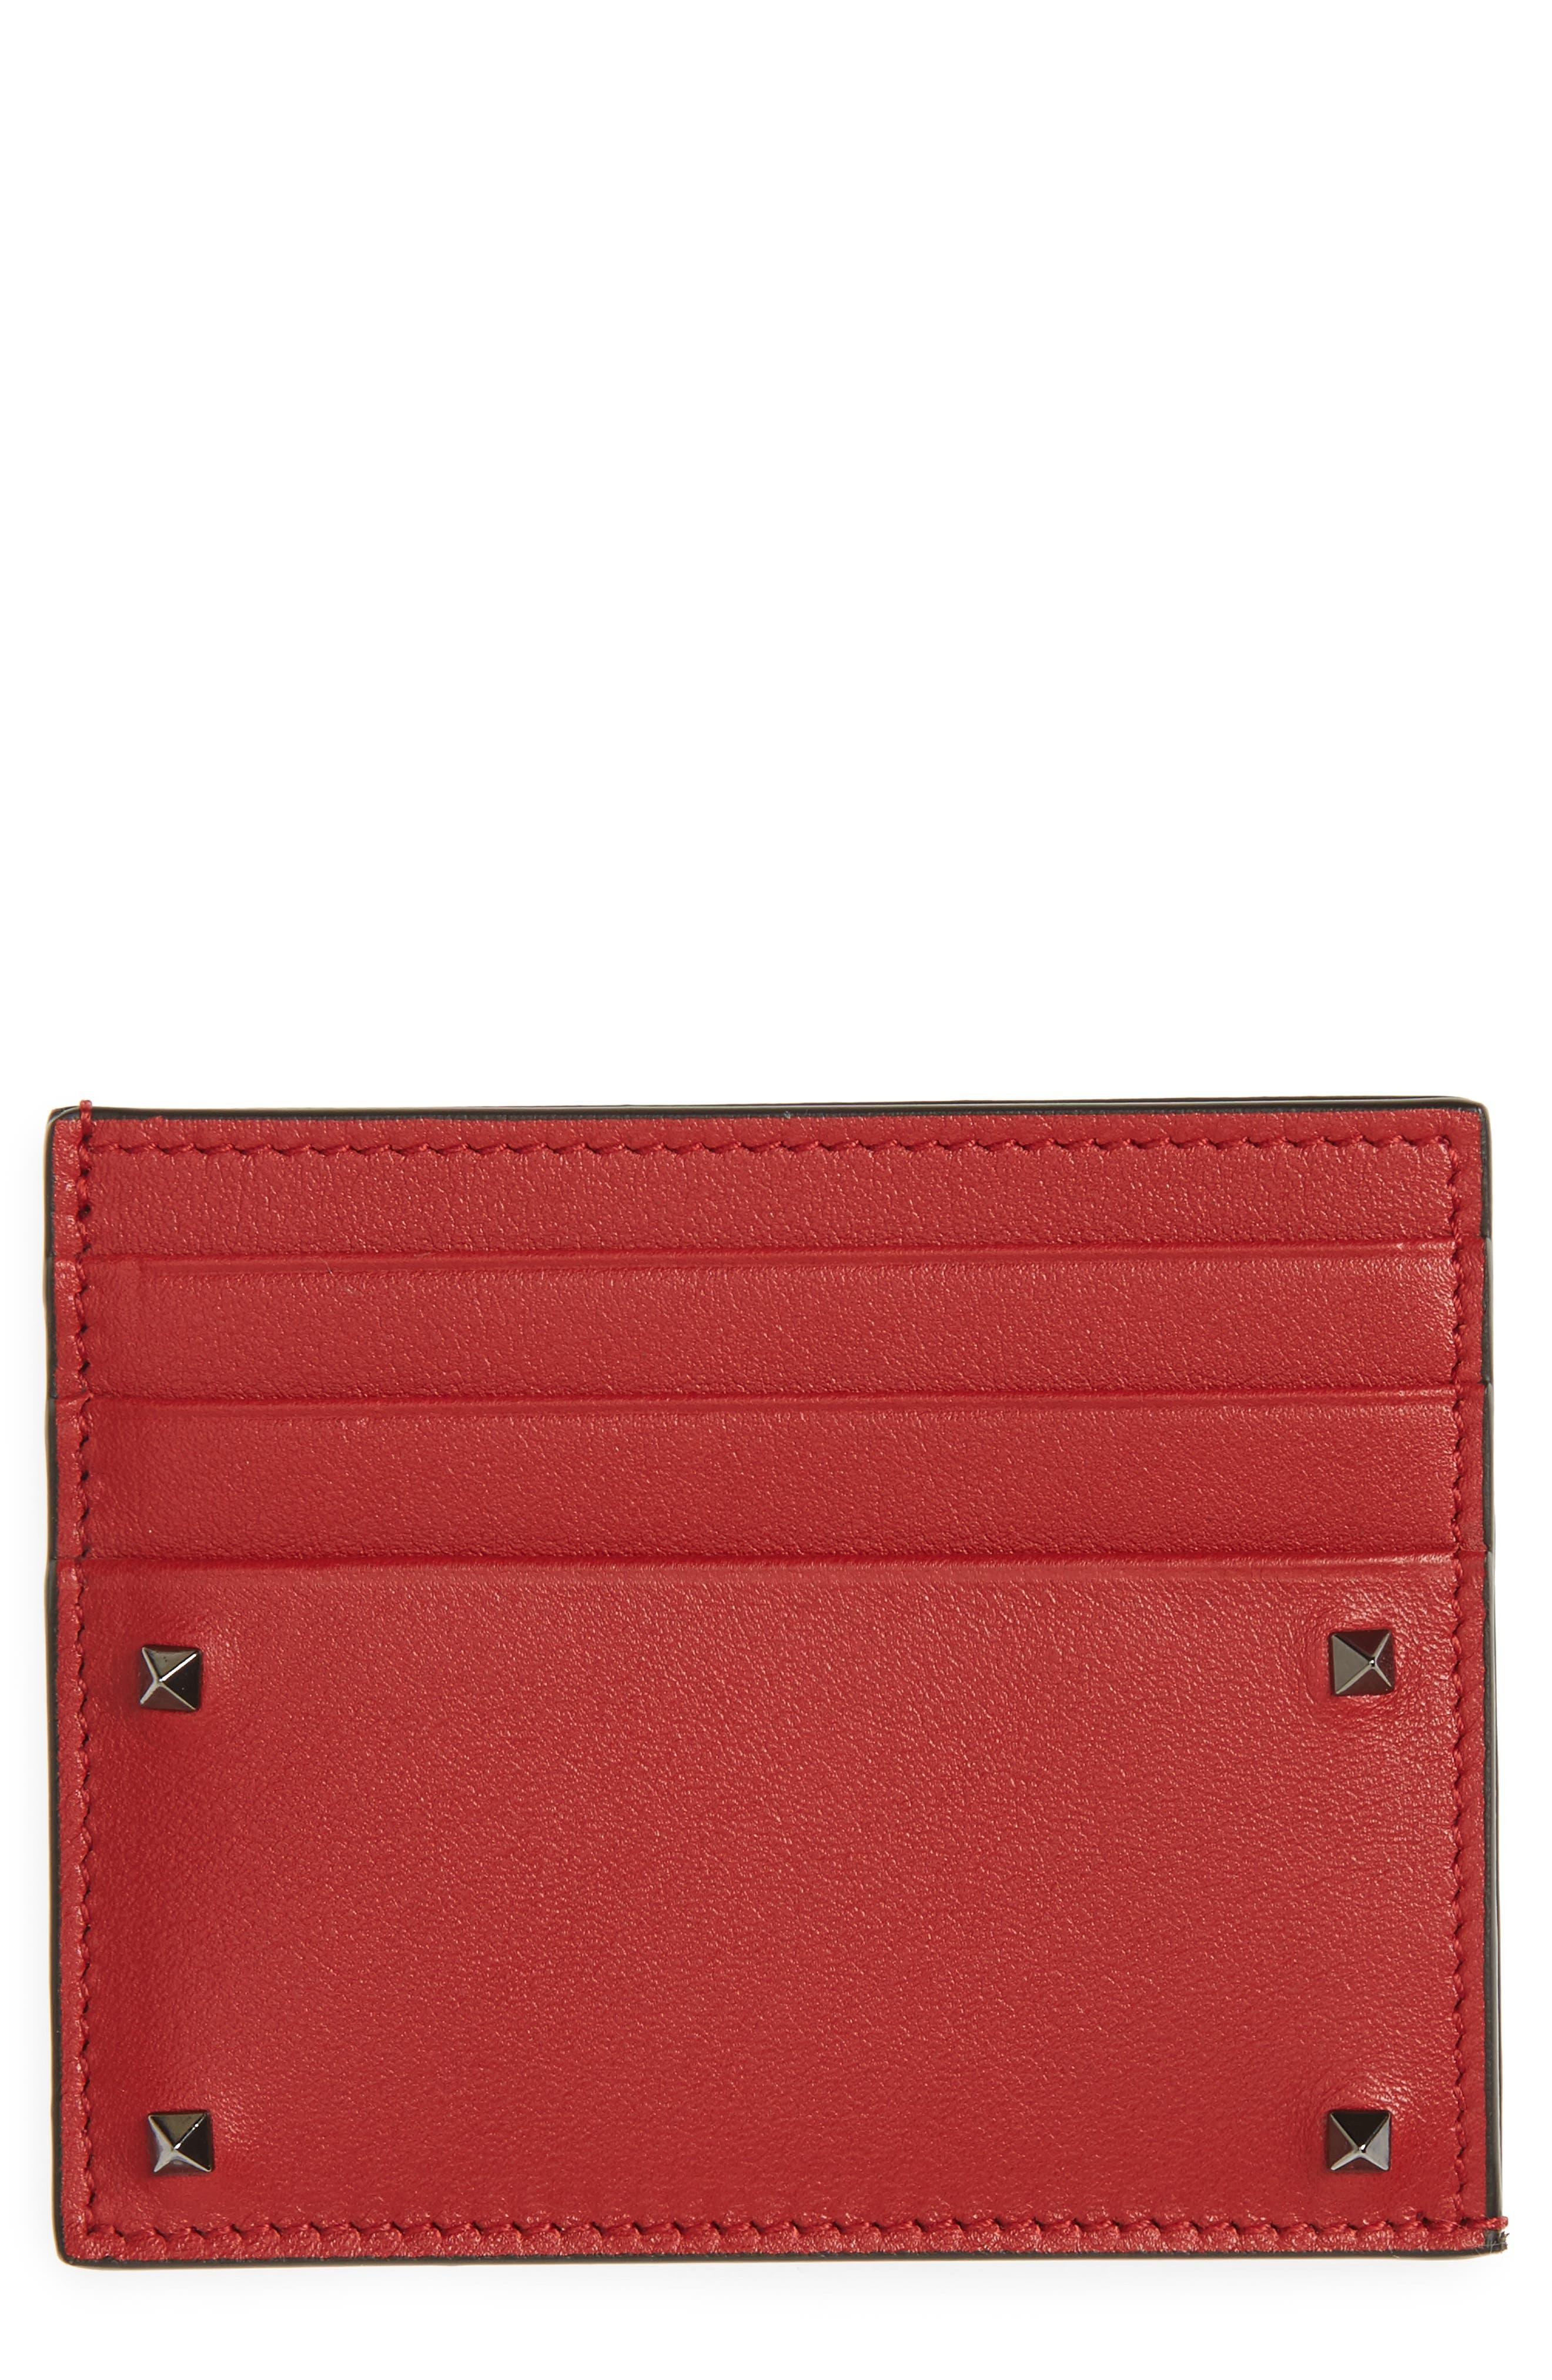 GARAVANI Mini Rock Stud Leather Card Case,                             Main thumbnail 1, color,                             Red